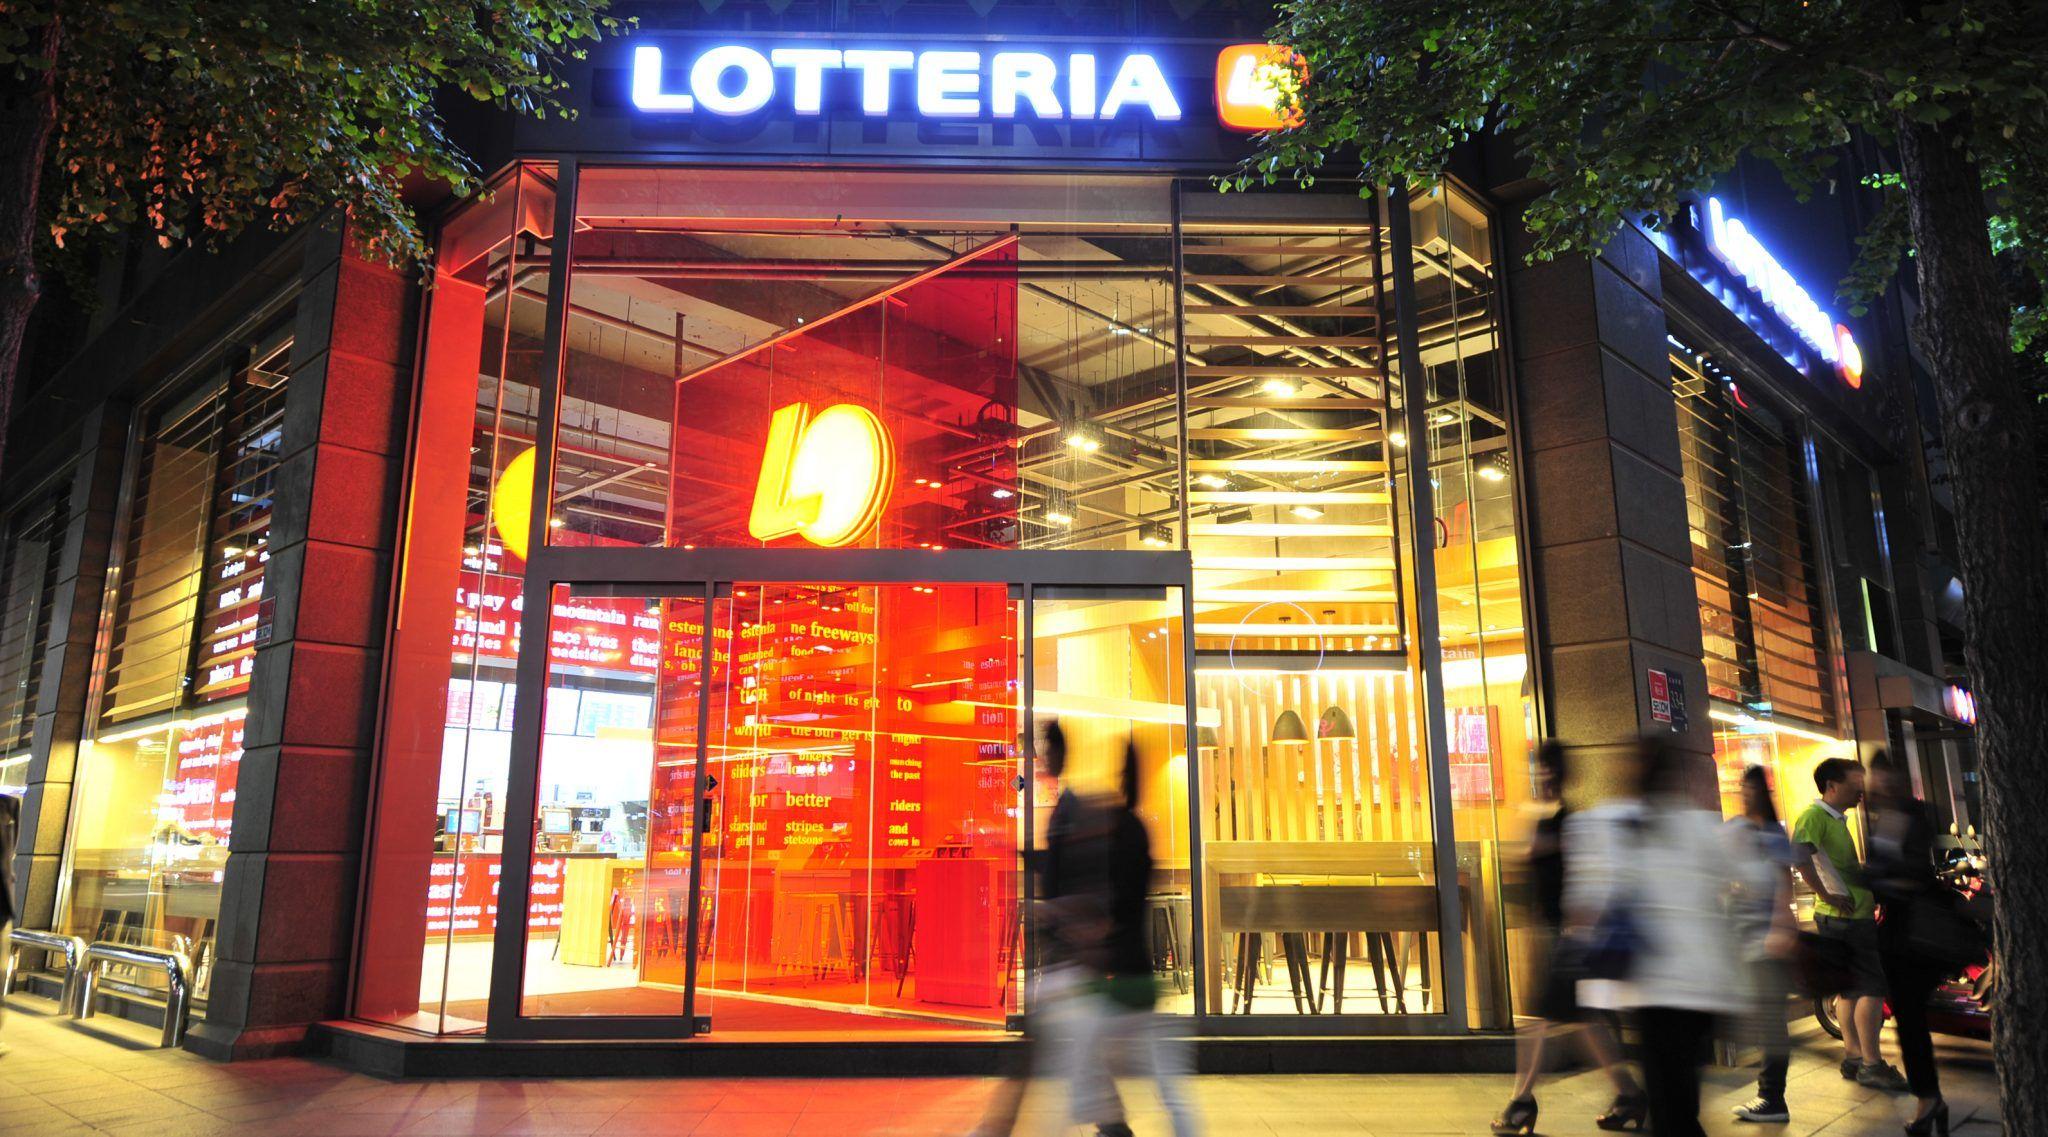 Lotteria - lotteria - qwe.wiki